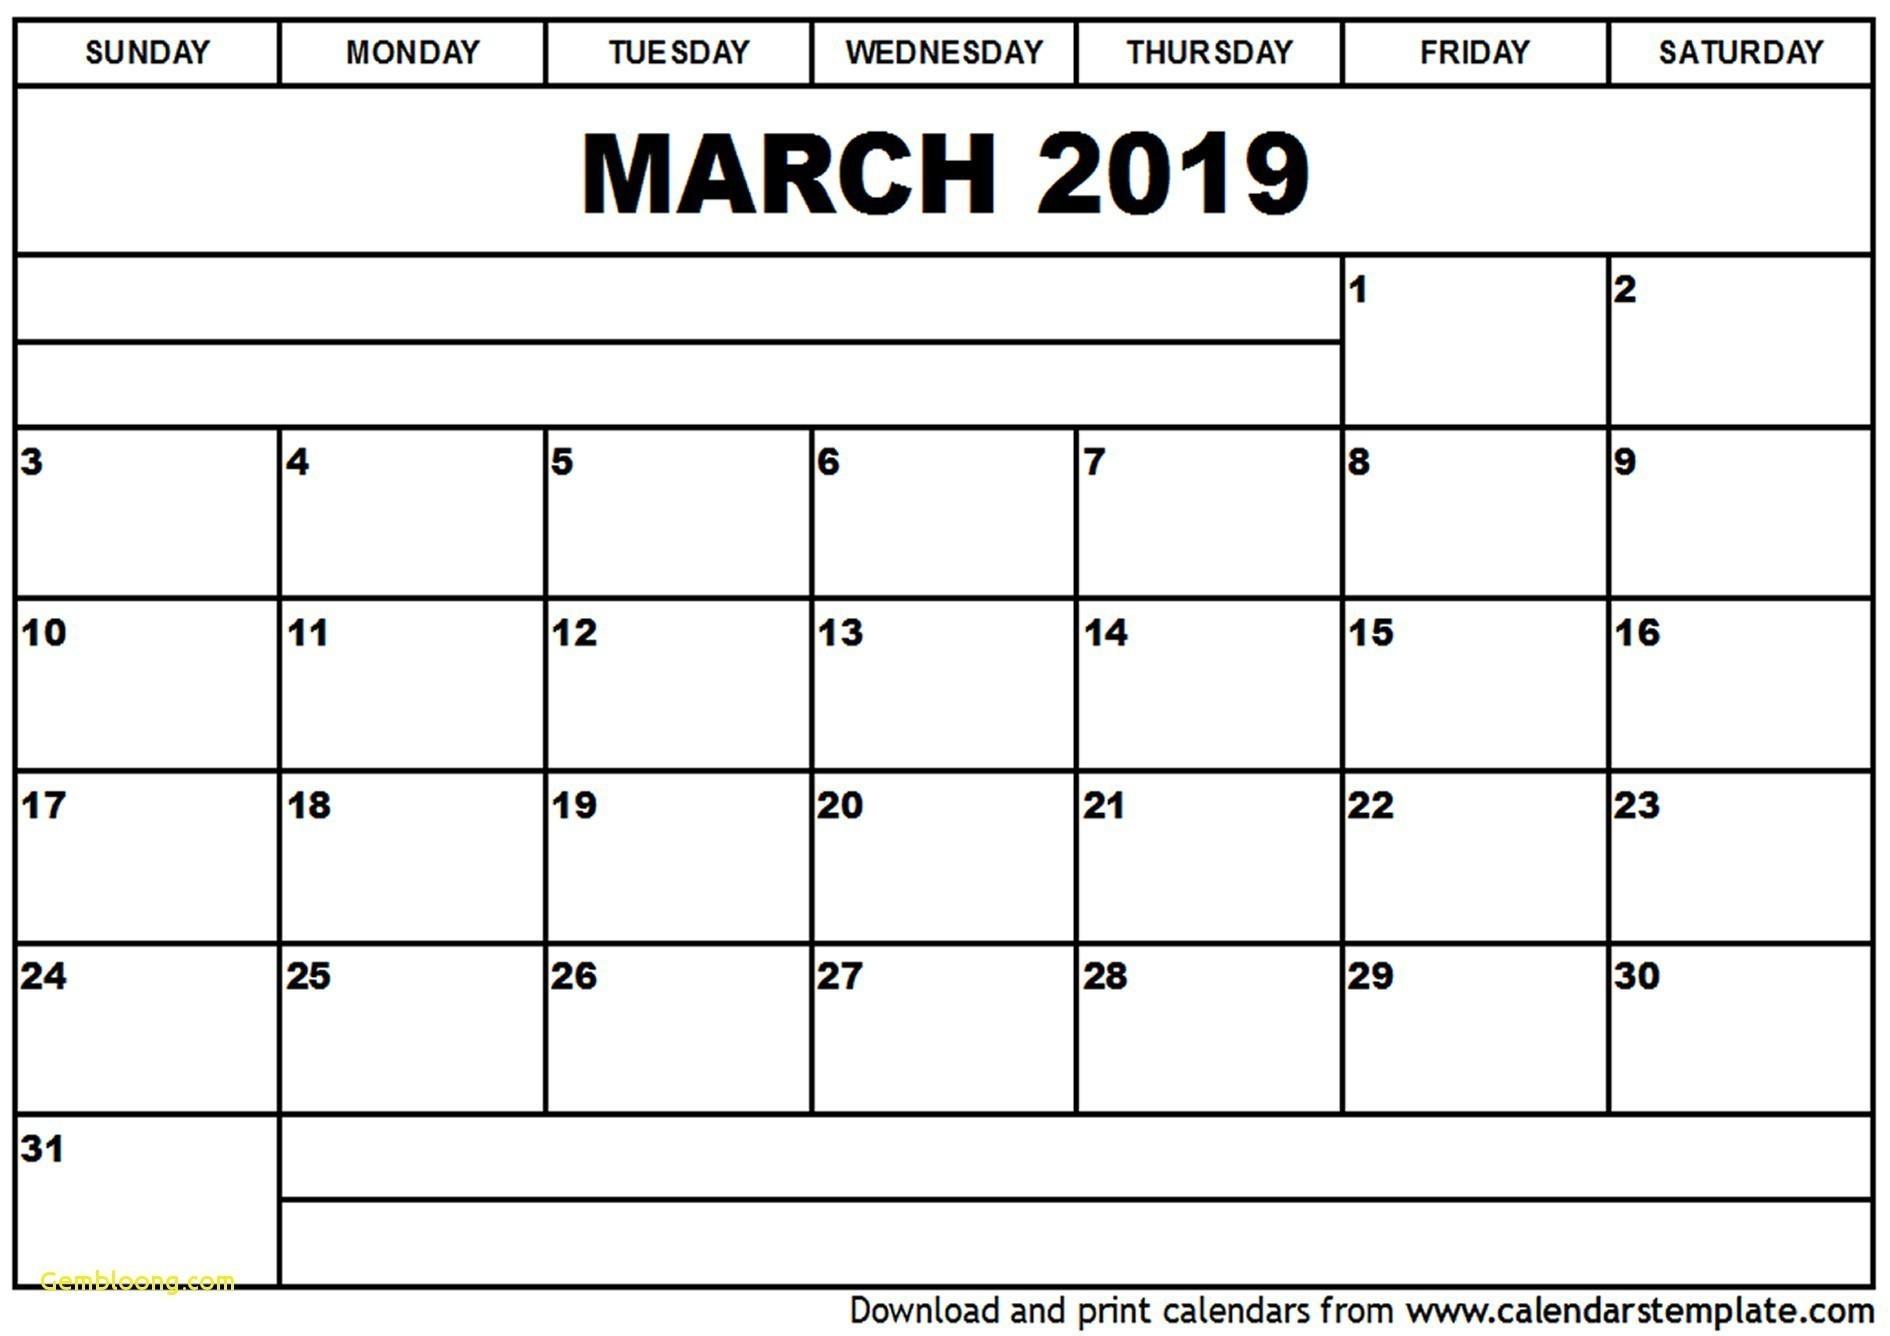 Free 2019 Printable Monthly Calendar Unique Feb Calendar 2019 Printable Beautiful Month Od December Calendar